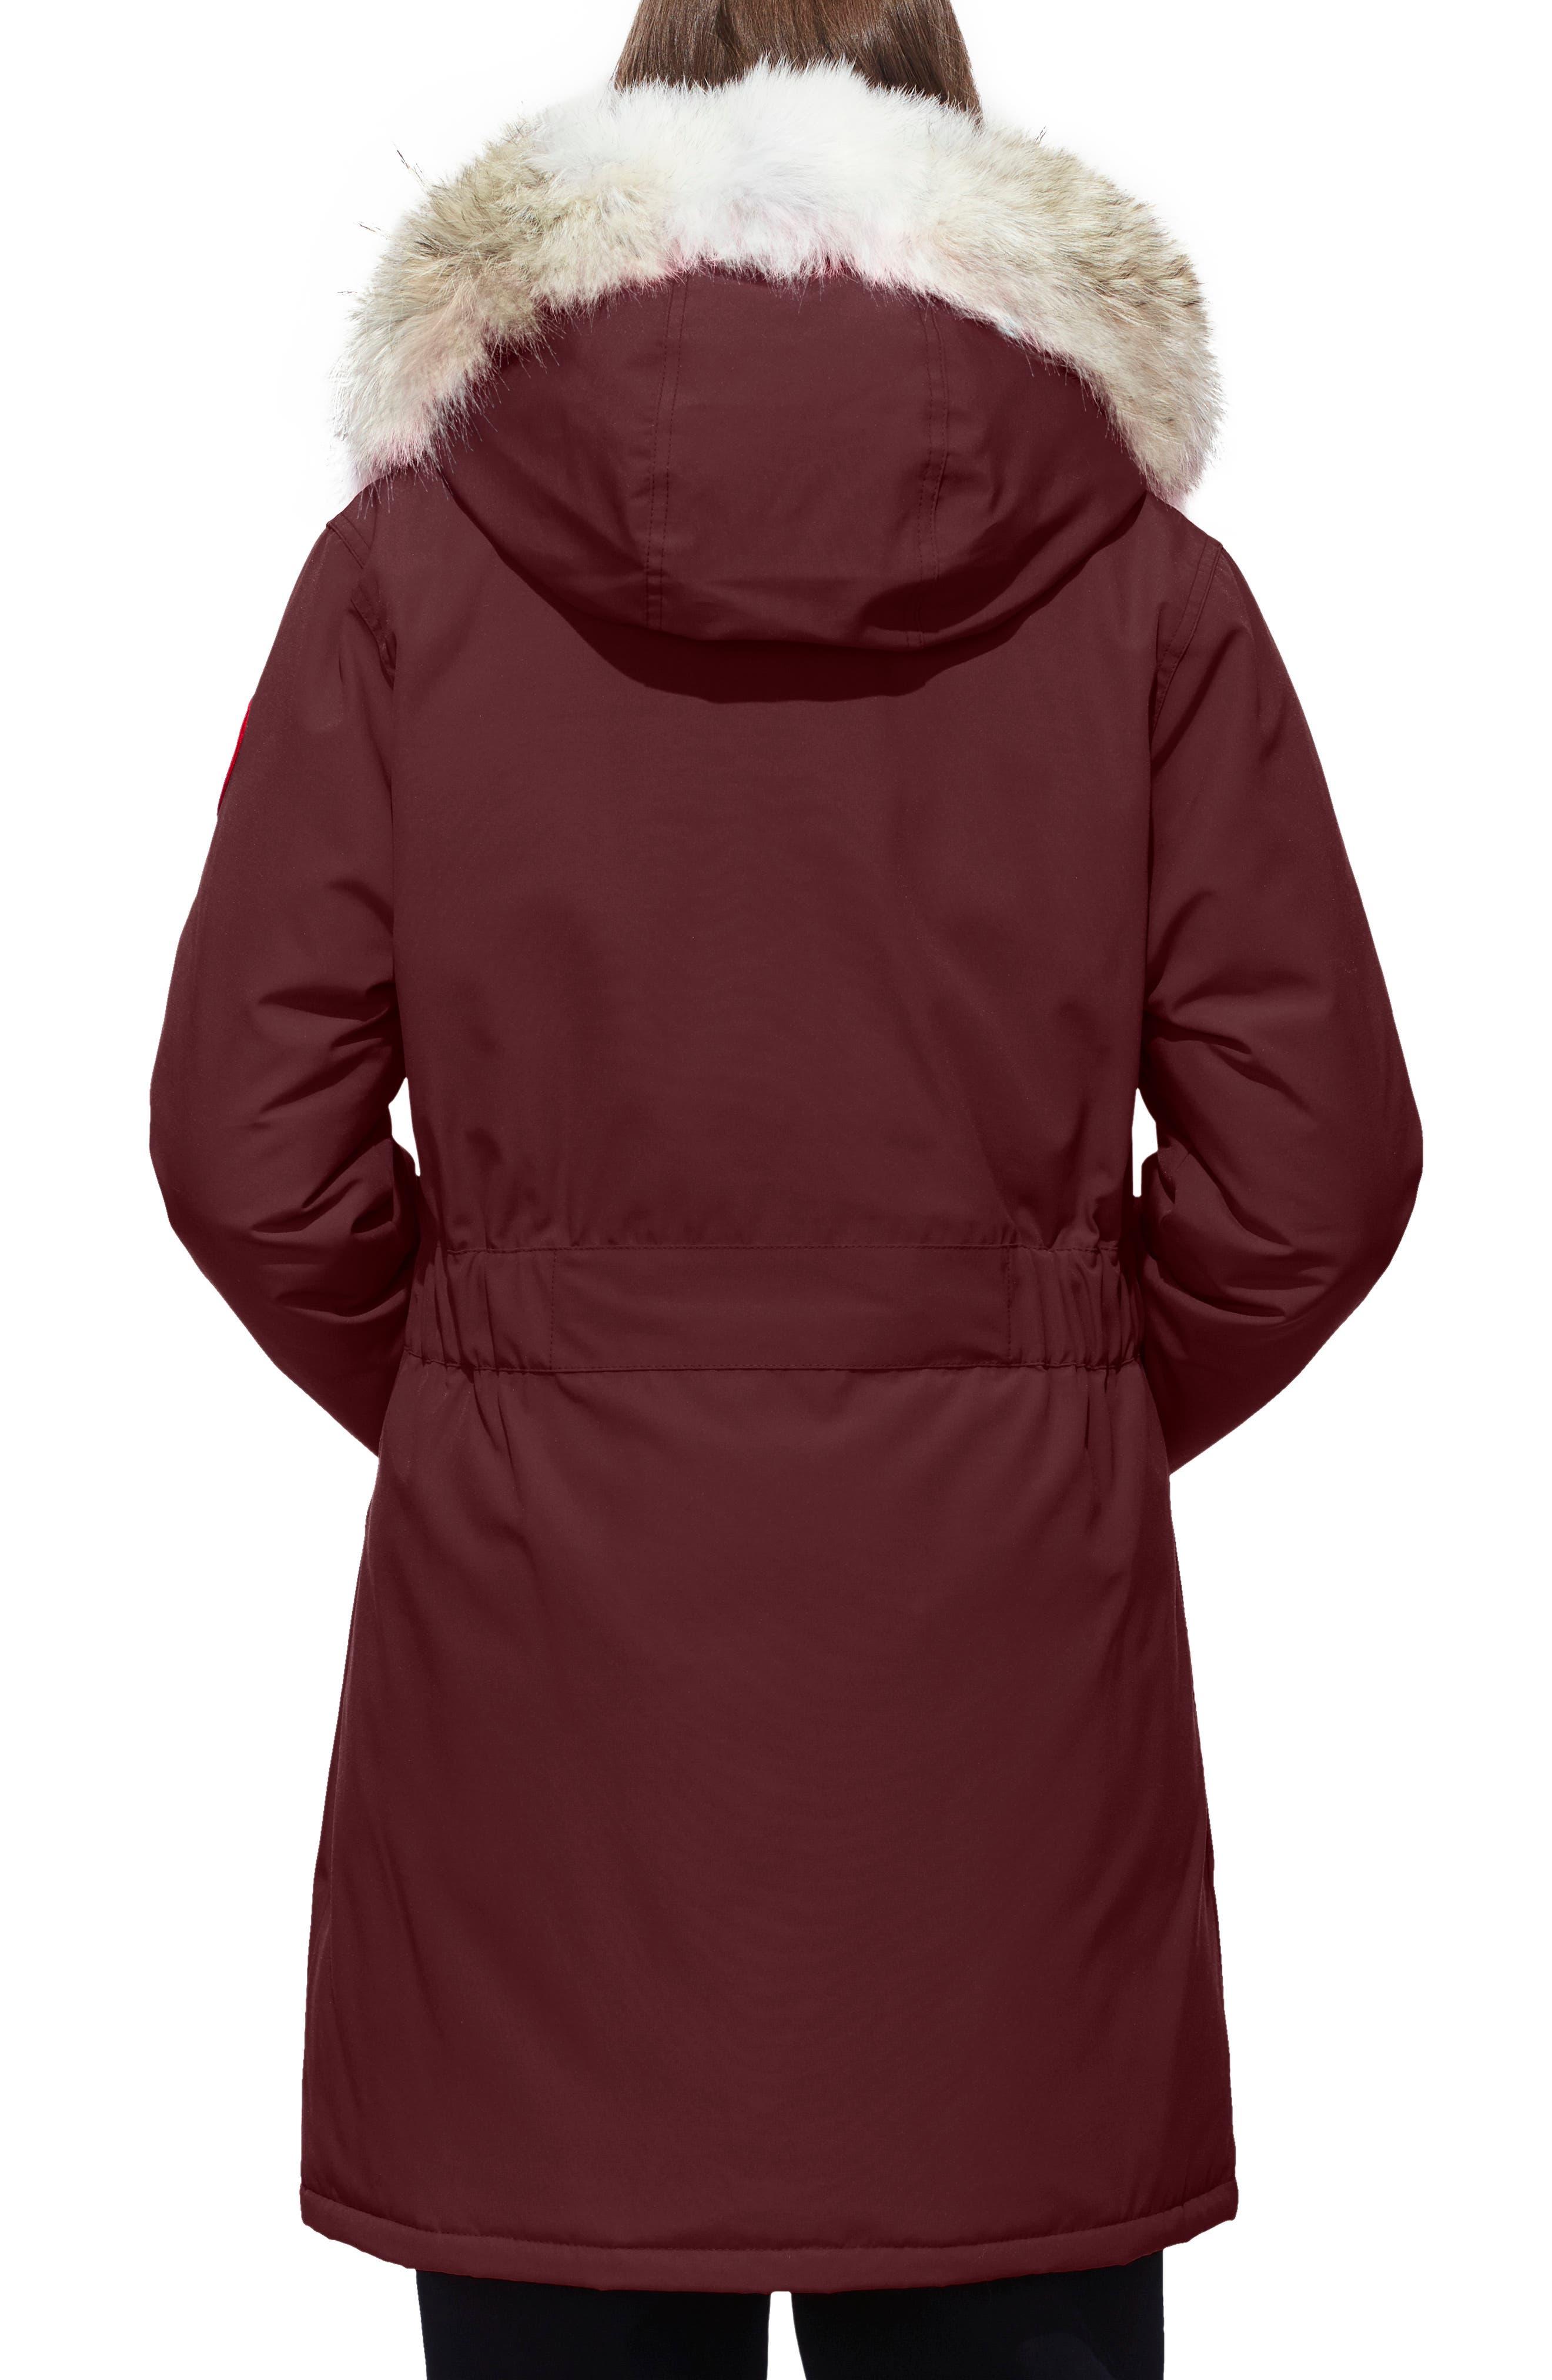 0549e6115561 Women's Fur (Genuine) Coats & Jackets | Nordstrom